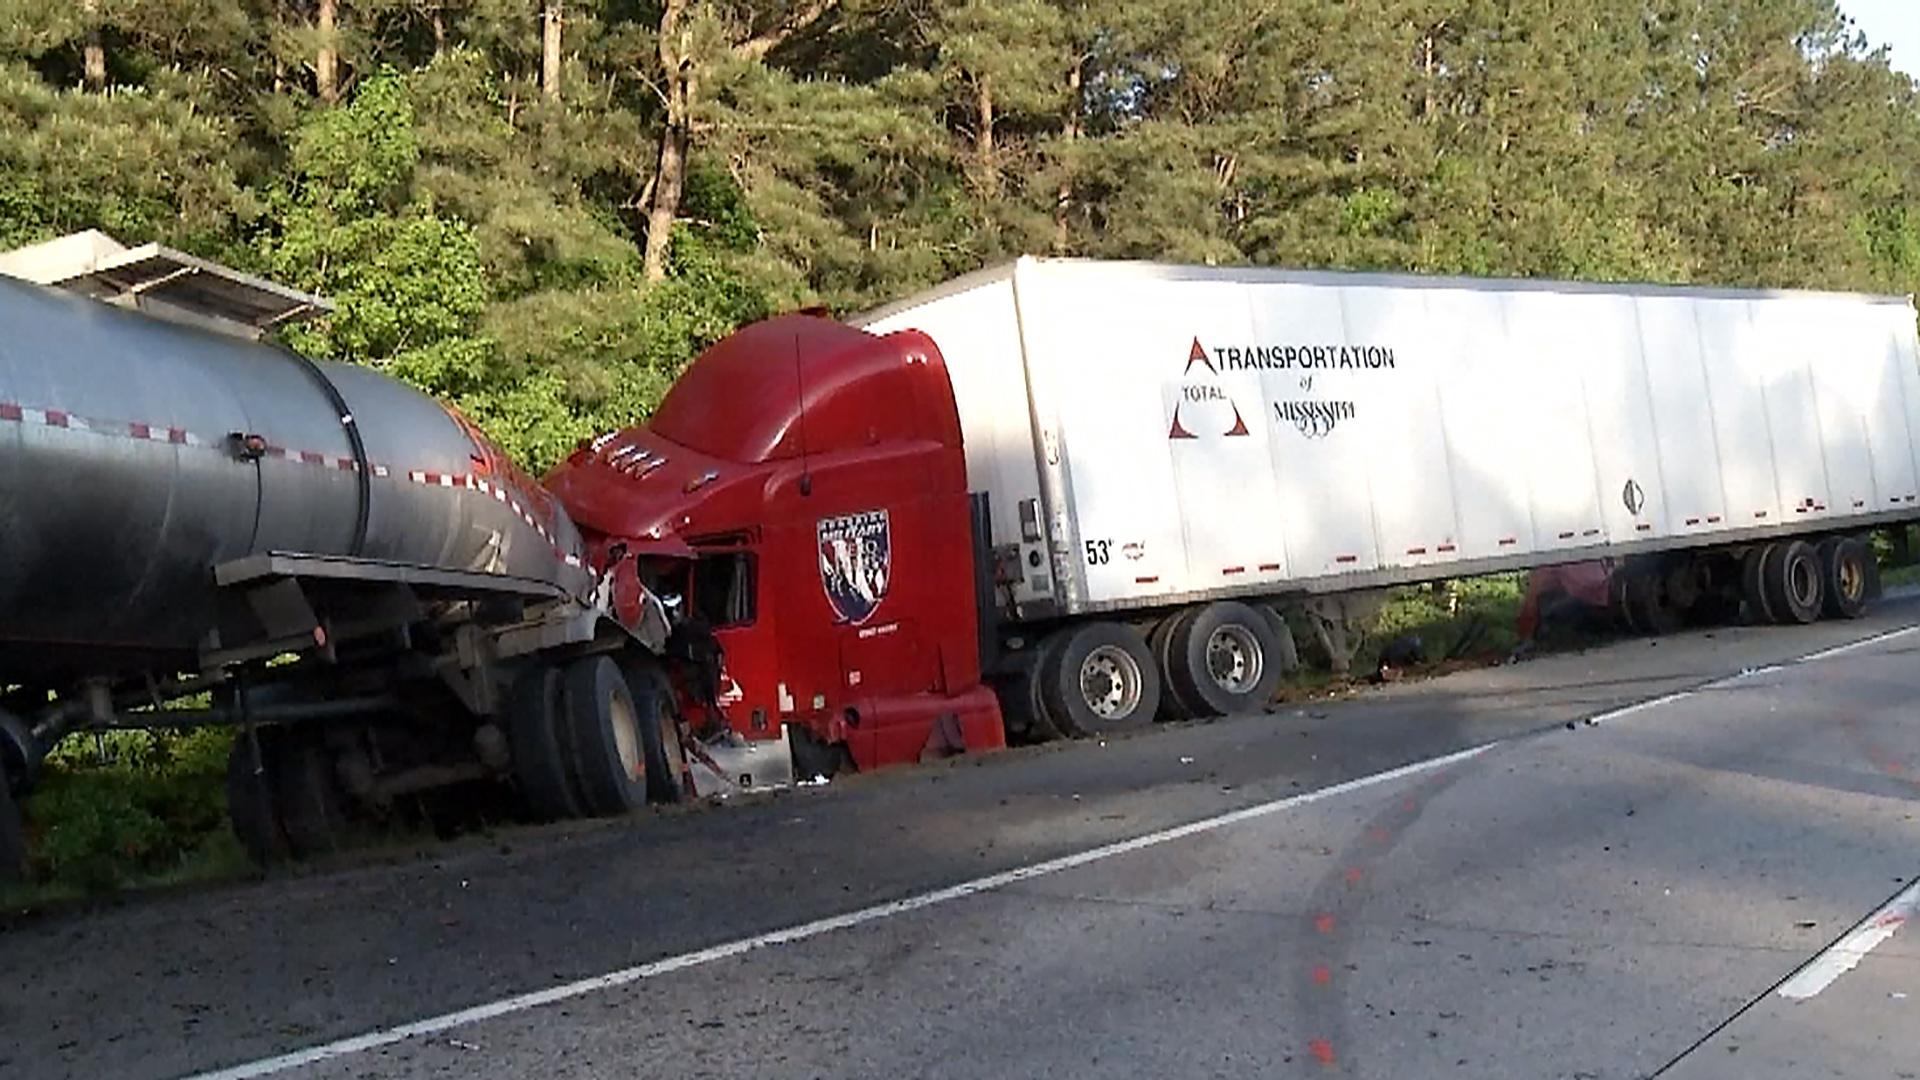 Five Nursing Students Killed, Two Injured in Crash Near Savannah